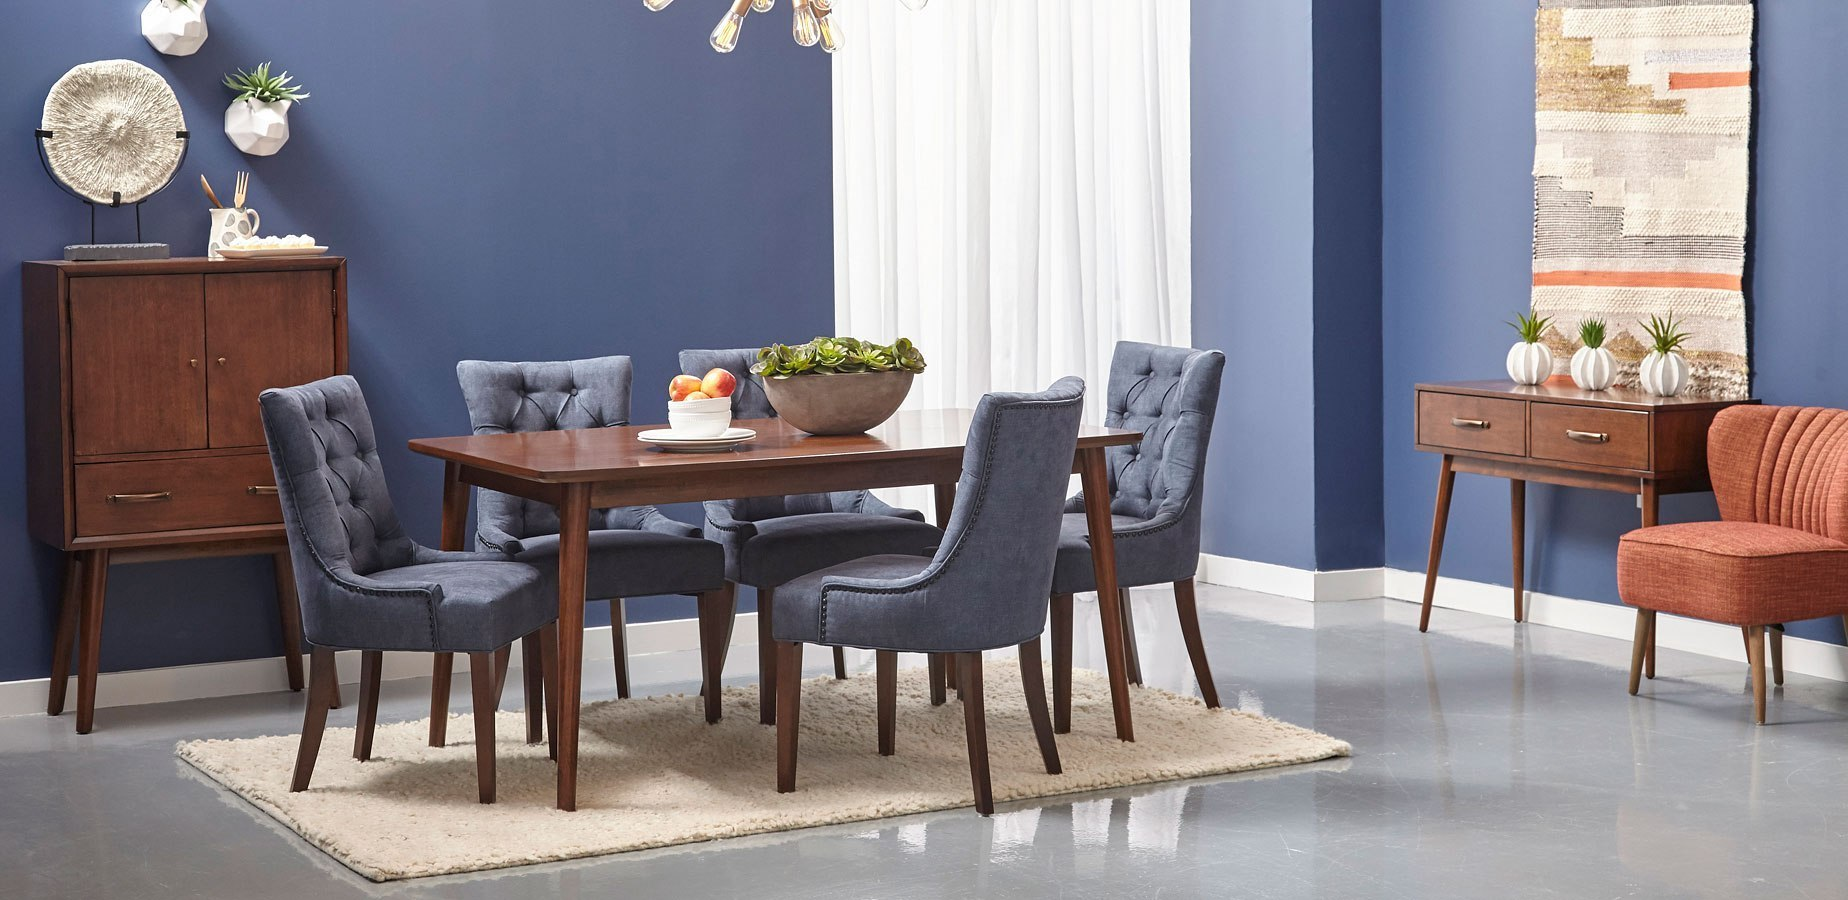 Draper Mid Century Modern Dining Room Set By Pulaski Furniture Furniturepick